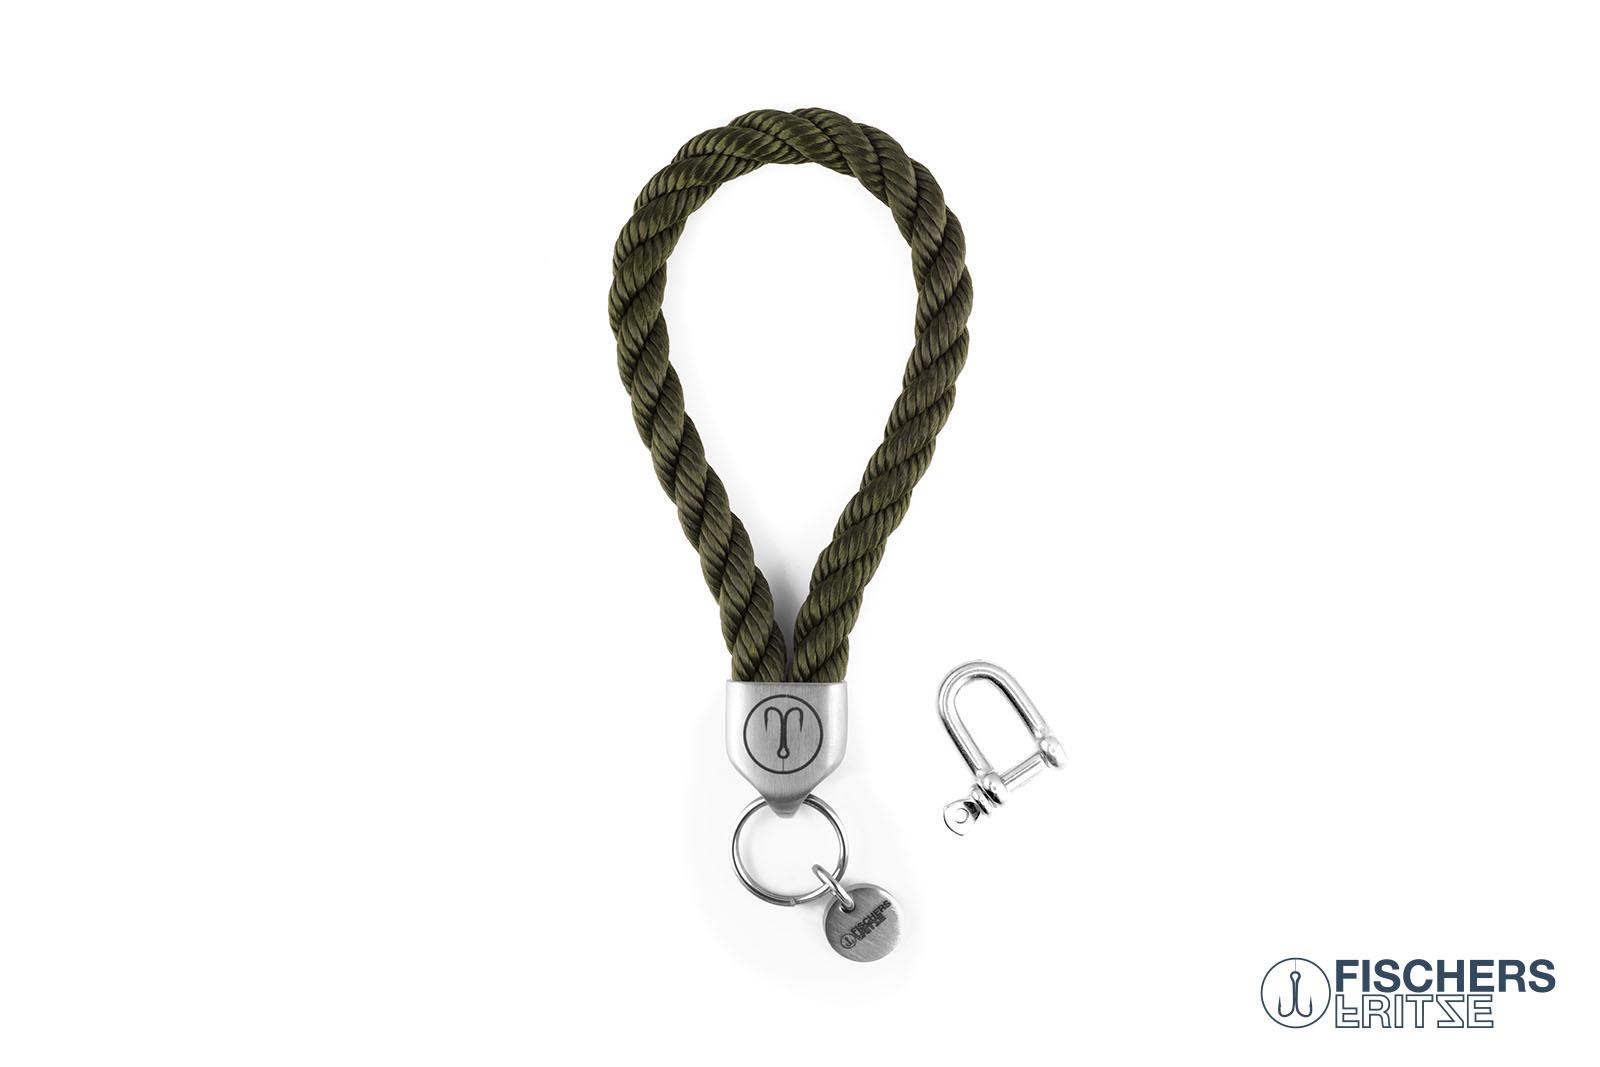 armband-fischers-fritze-dickerhering-olivgruen-segeltau-schaekel